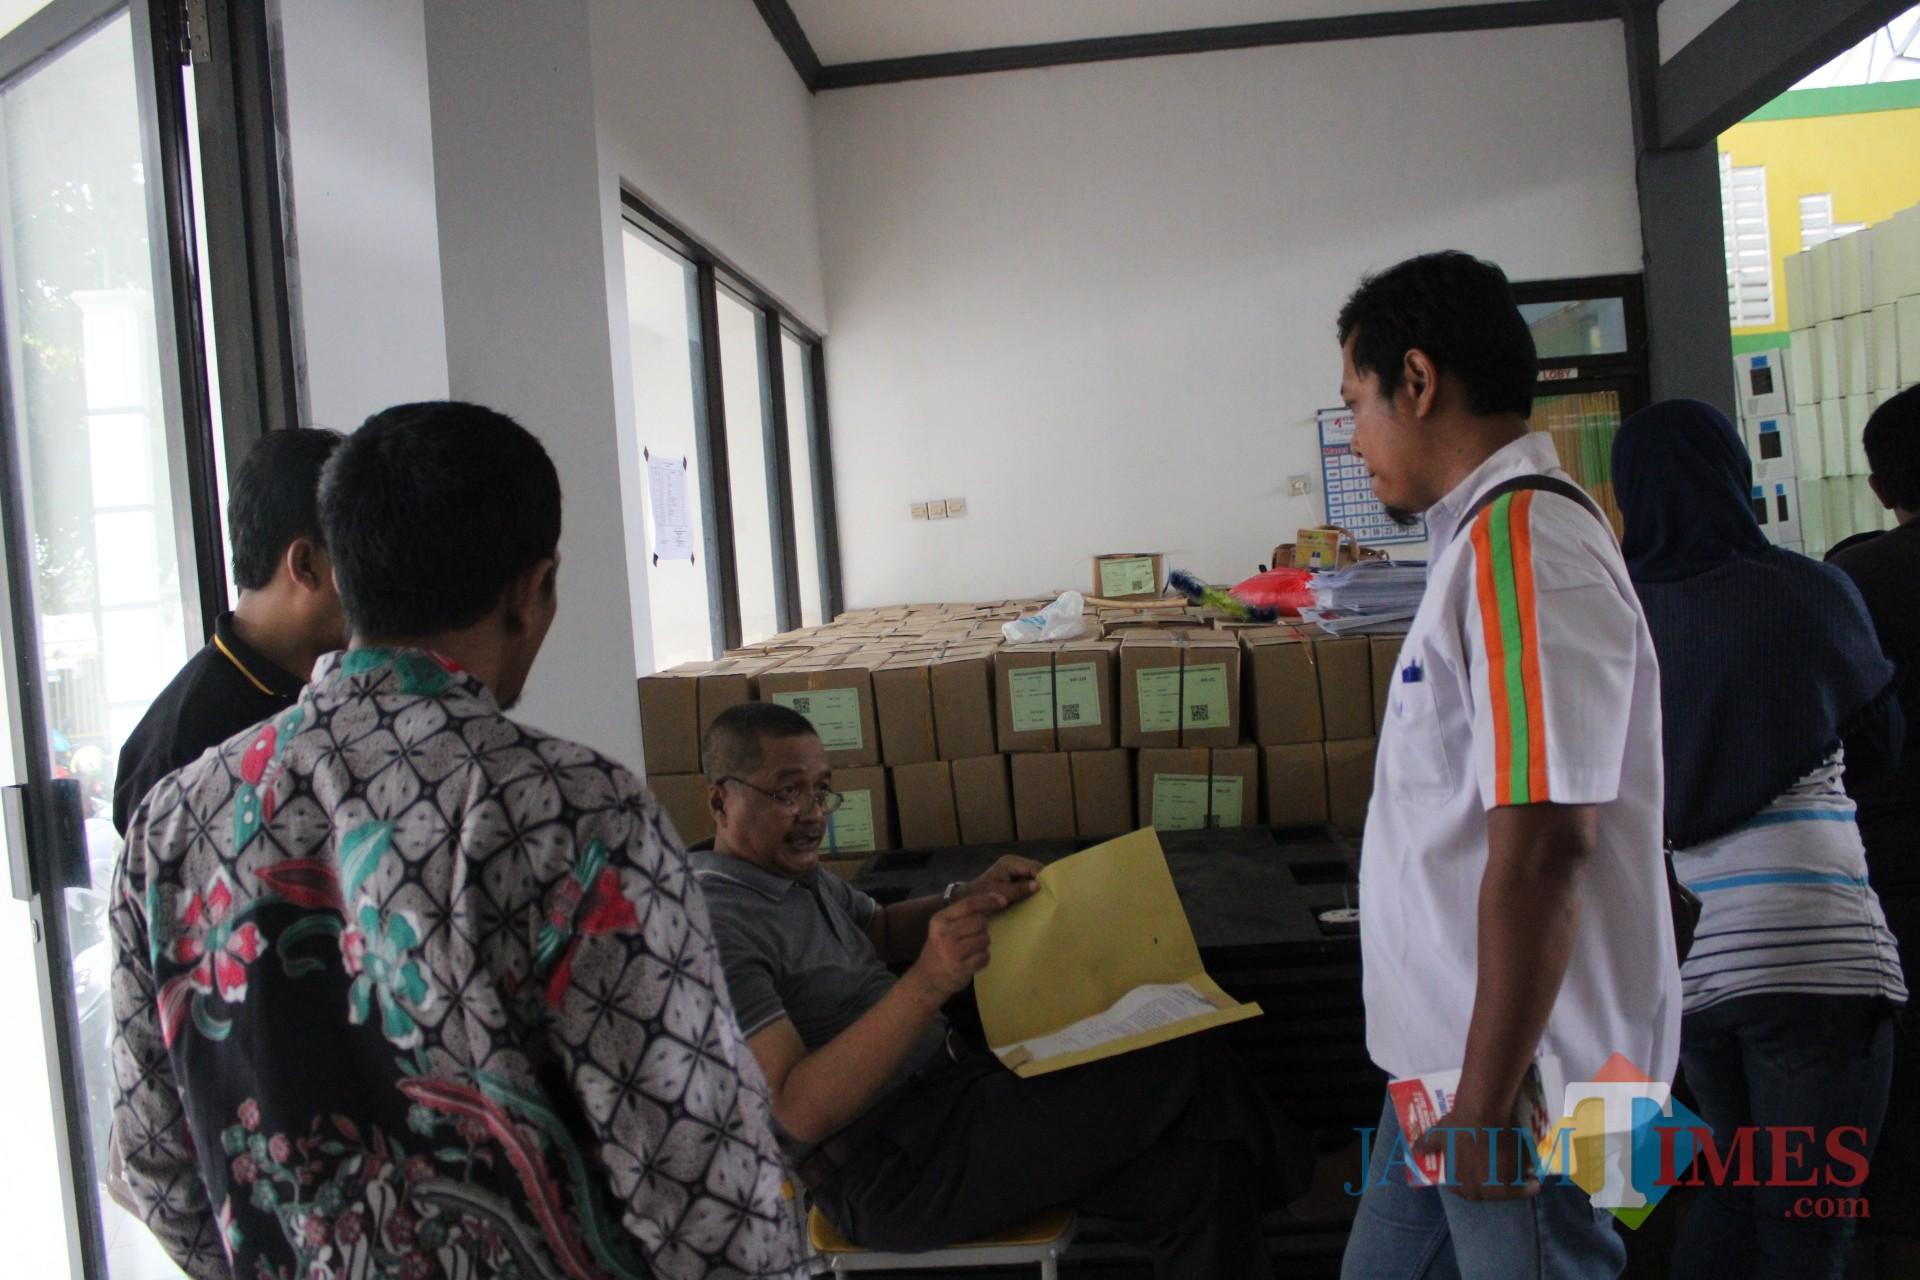 (duduk) Ketua KPU Kabupaten Jombang, Muhaimin Shofi saat melarang sejumlah anggota Panwascam Jombang masuk di lokasi pelipatan surat suara pemilu di gedung olahraga tennis indoor jombang. (Foto : Adi Rosul / JombangTIMES)